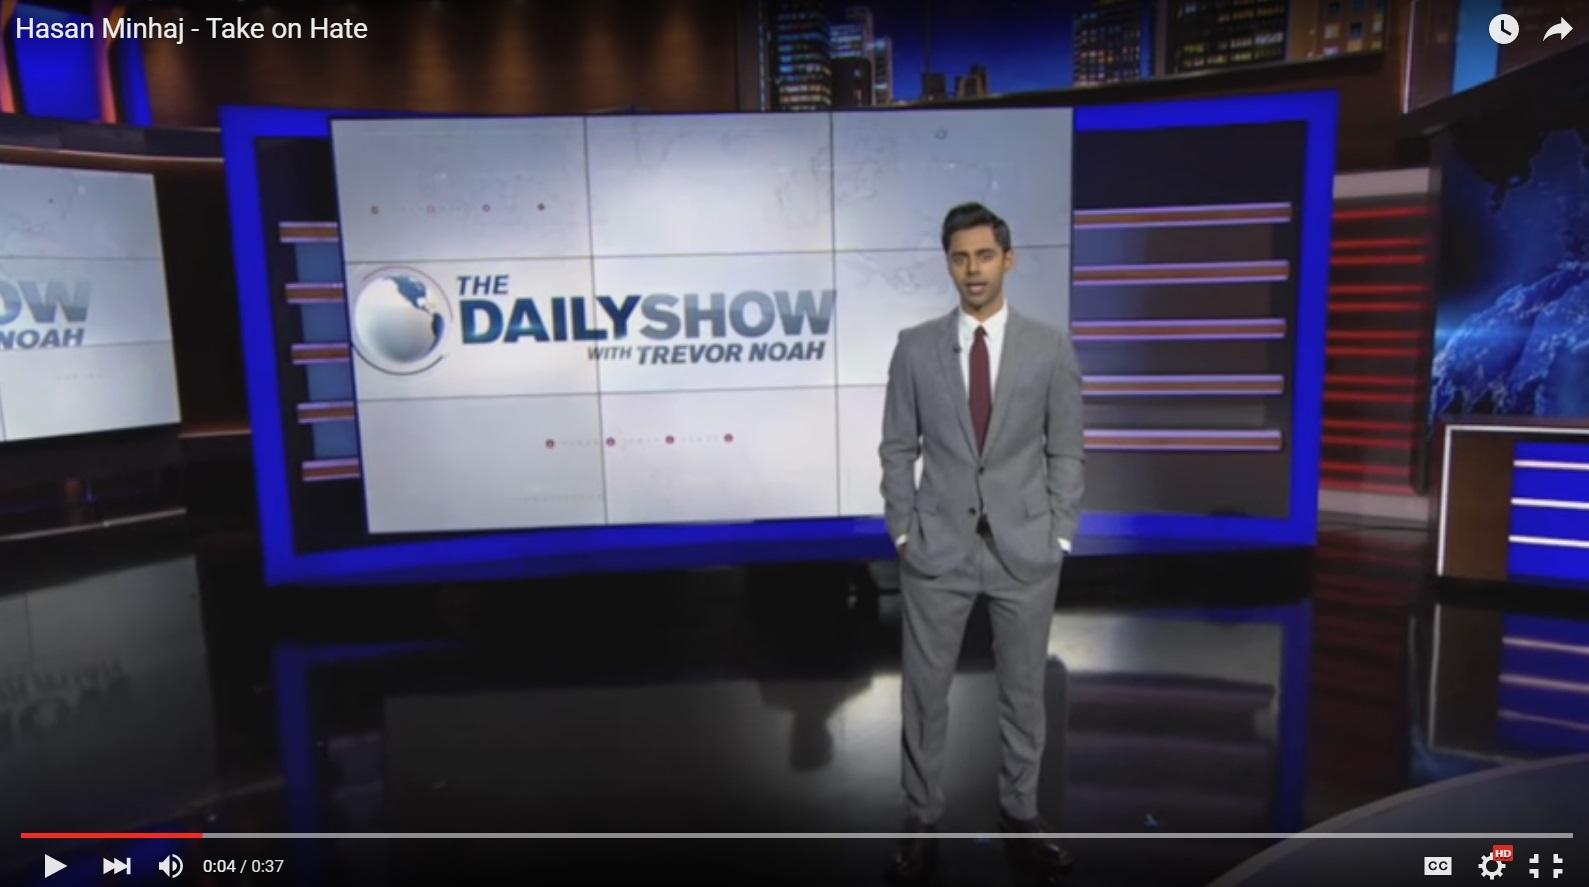 HasanMinhajvideoscreenshot.jpg